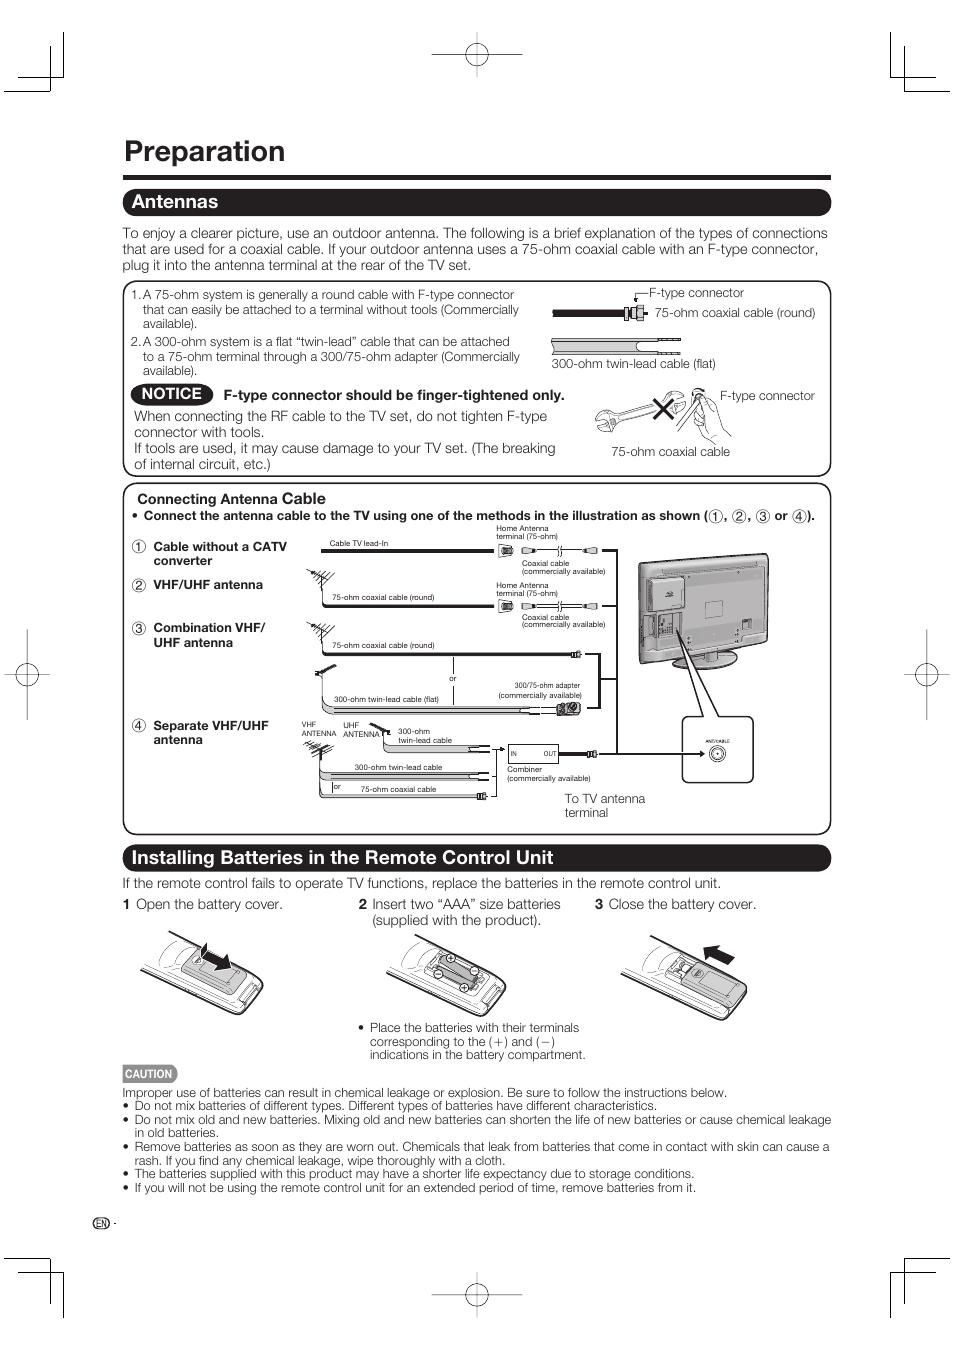 preparation antennas installing batteries in the remote control rh manualsdir com sharp aquos 65 inch led smart tv manual manual tv sharp aquos 65 español